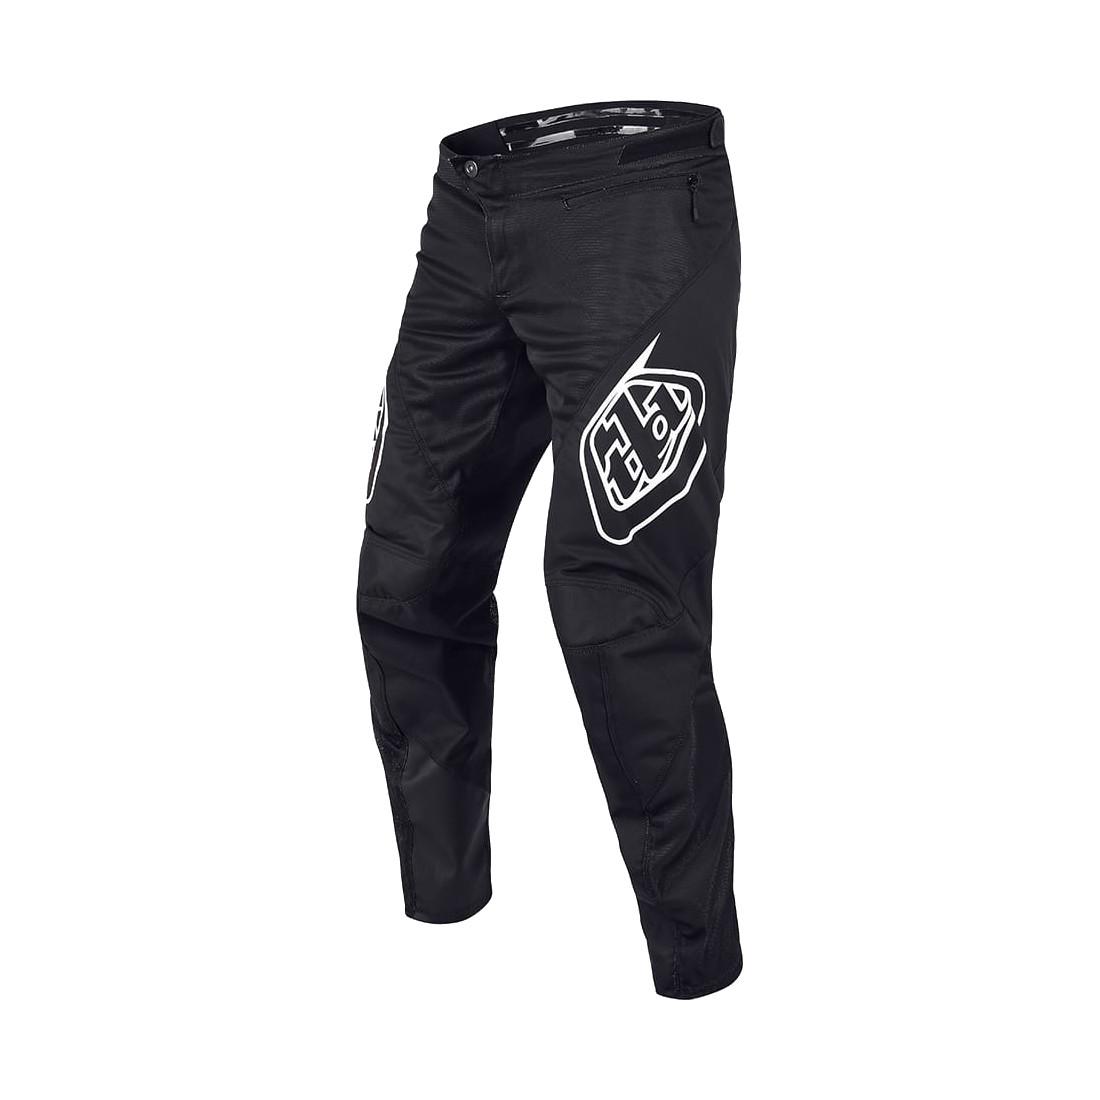 DH/Enduro Sprint MTB Pants Black Size XS (28)